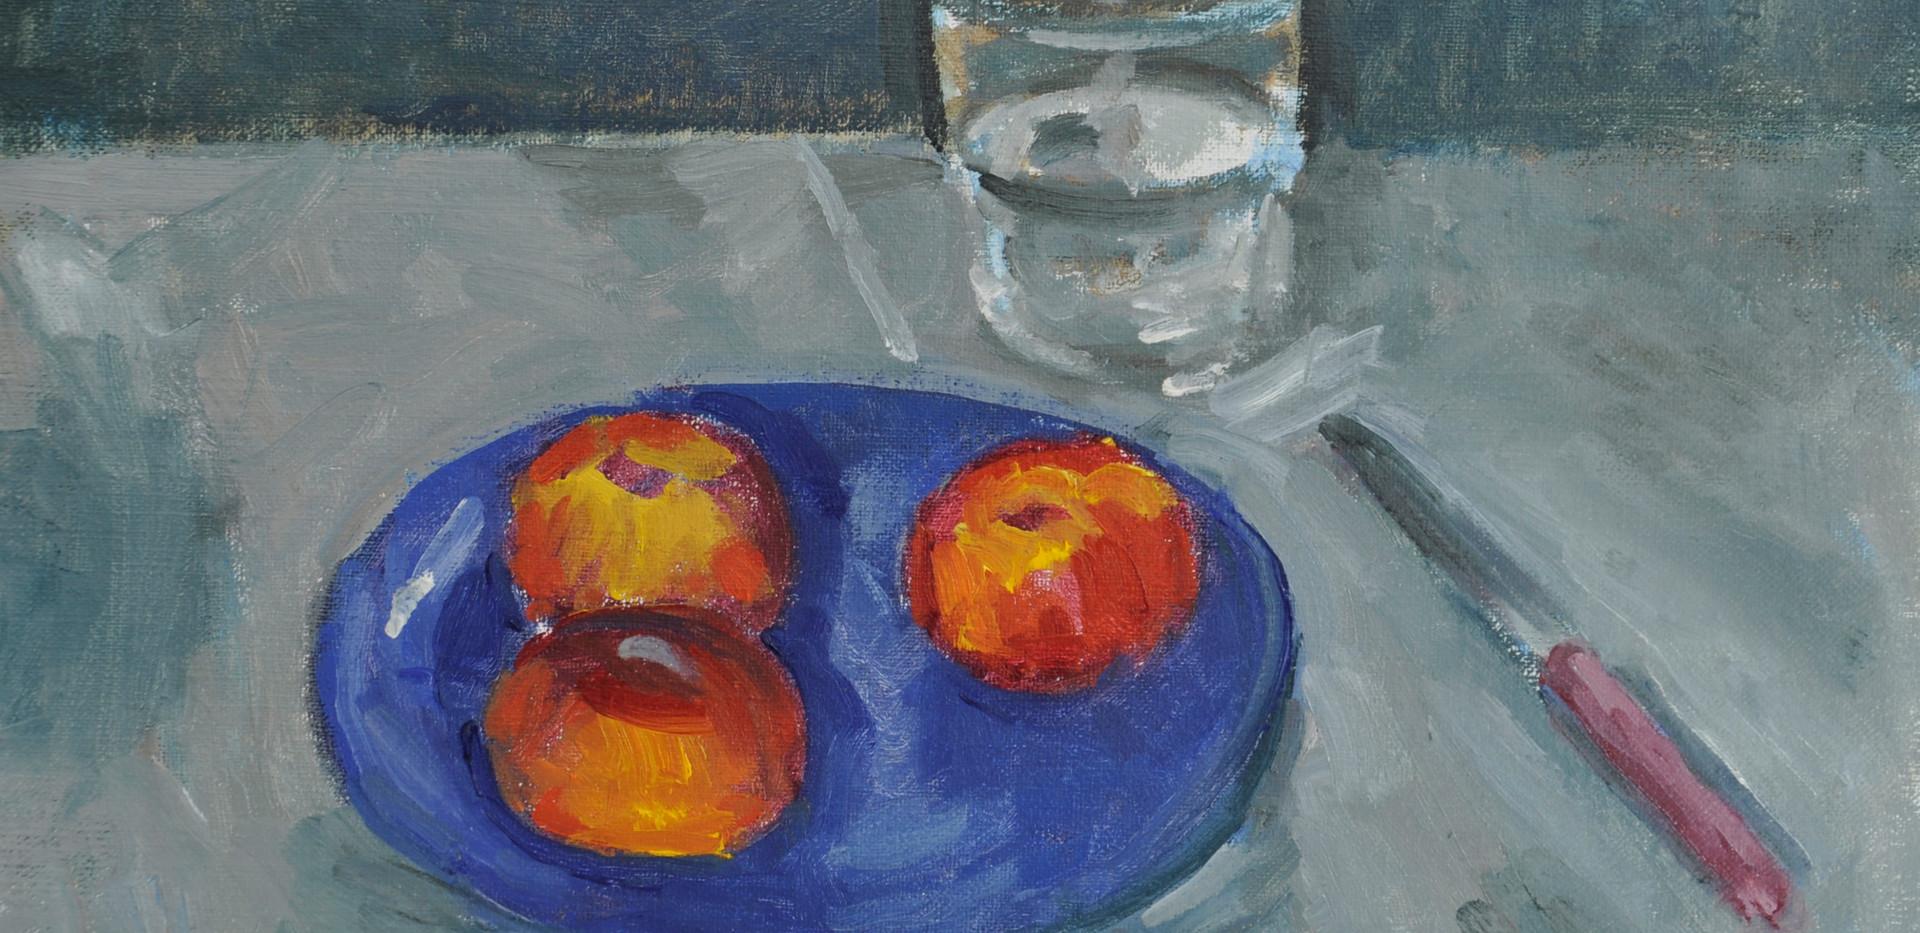 Peaches on a Blue Plate